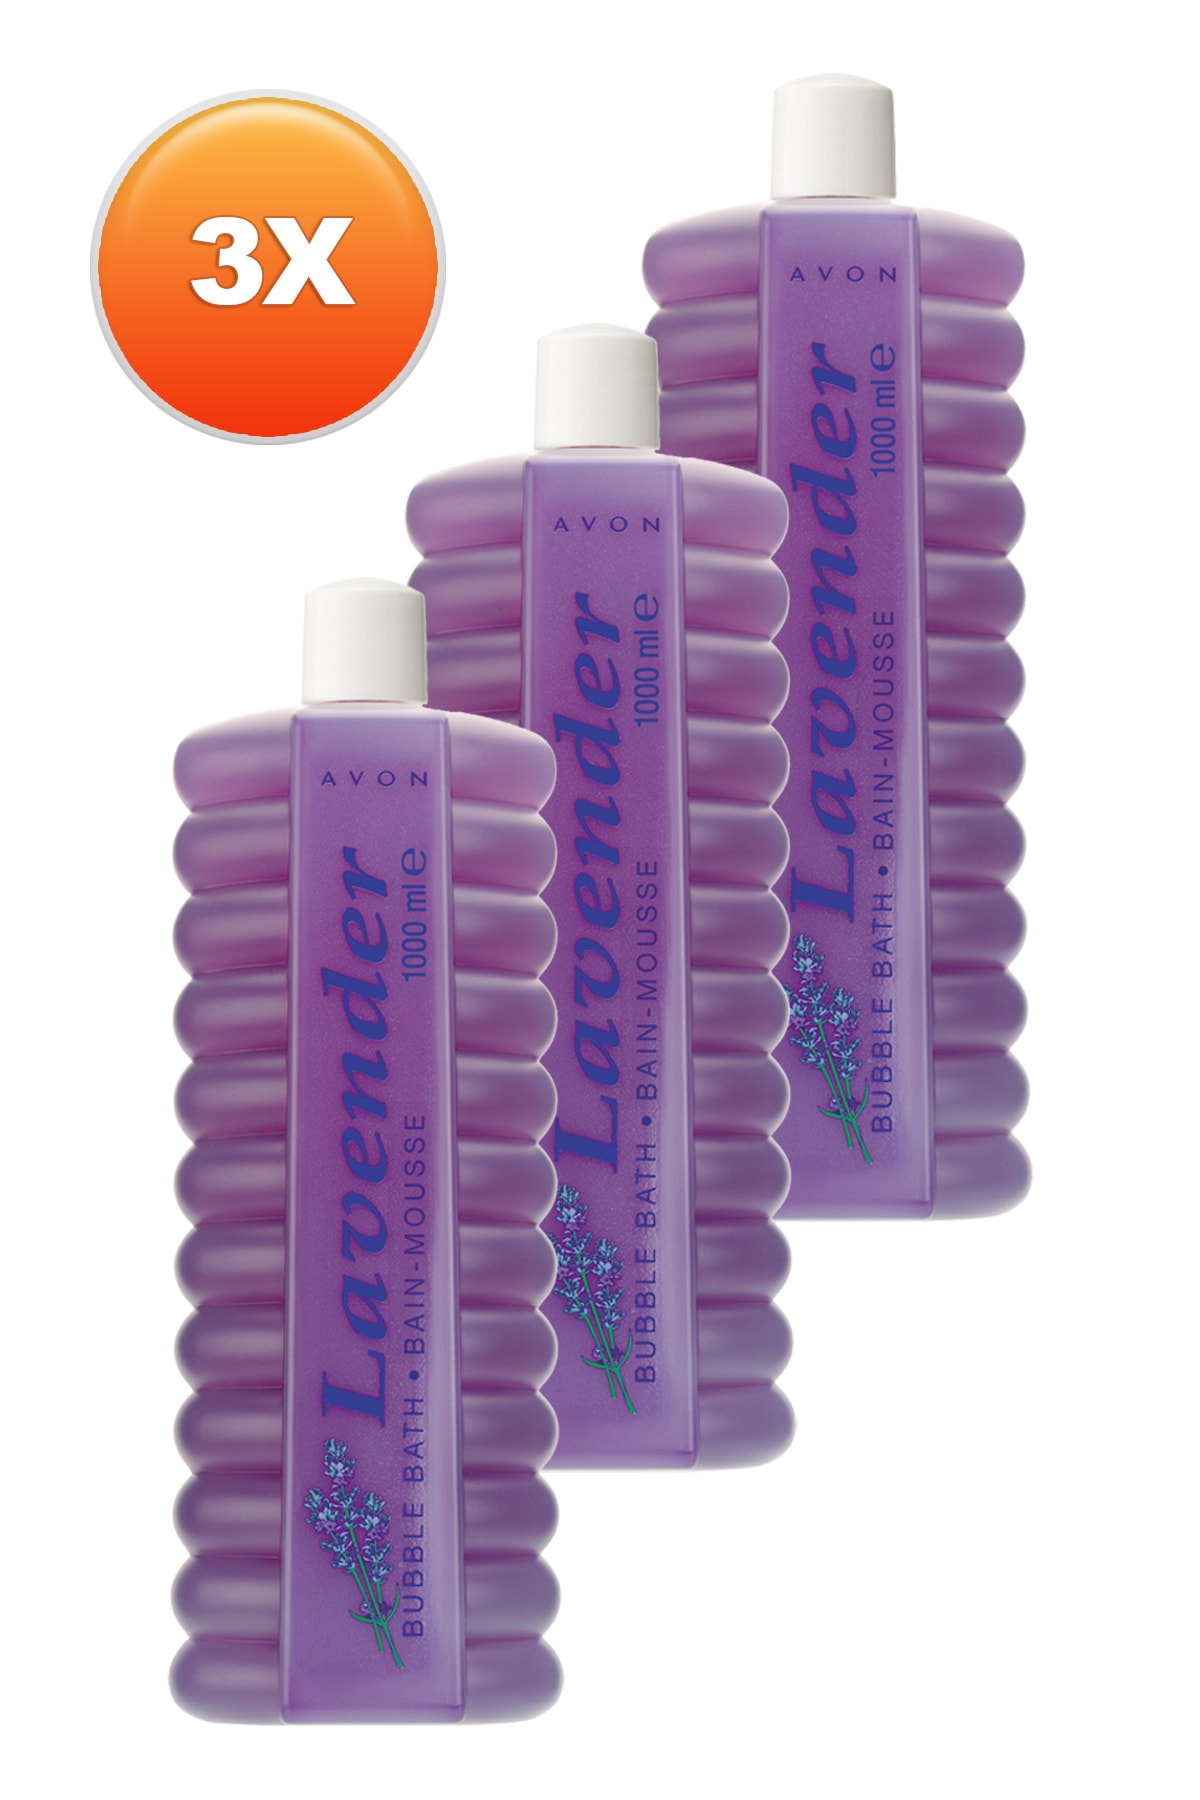 AVON Bubble Bath Lavantalı Banyo Köpüğü 1lt 3'lü Paket 1